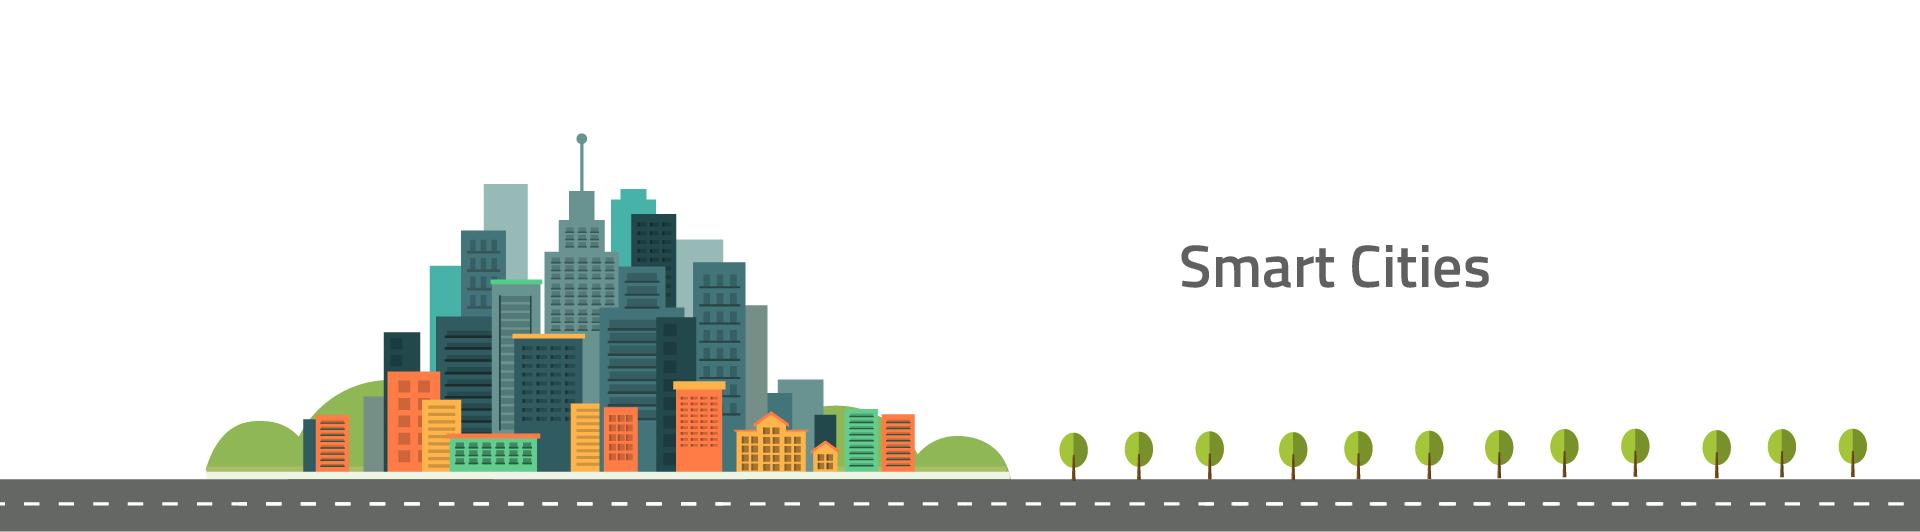 smart-cities-solution